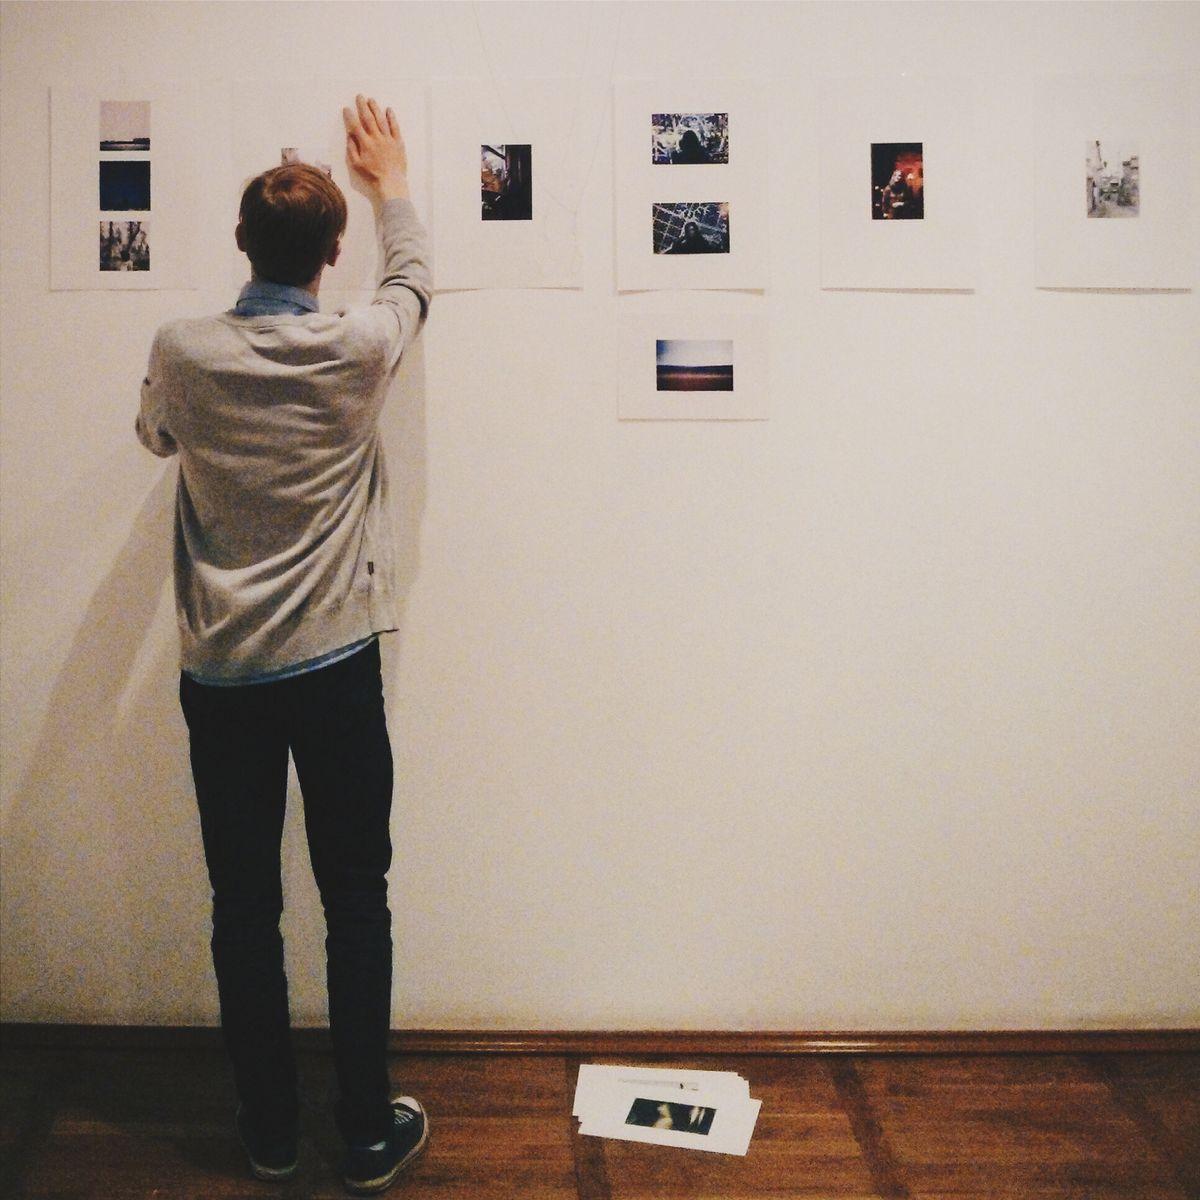 Подготовка выставки. Фото: архив Валентина ДУДУКА